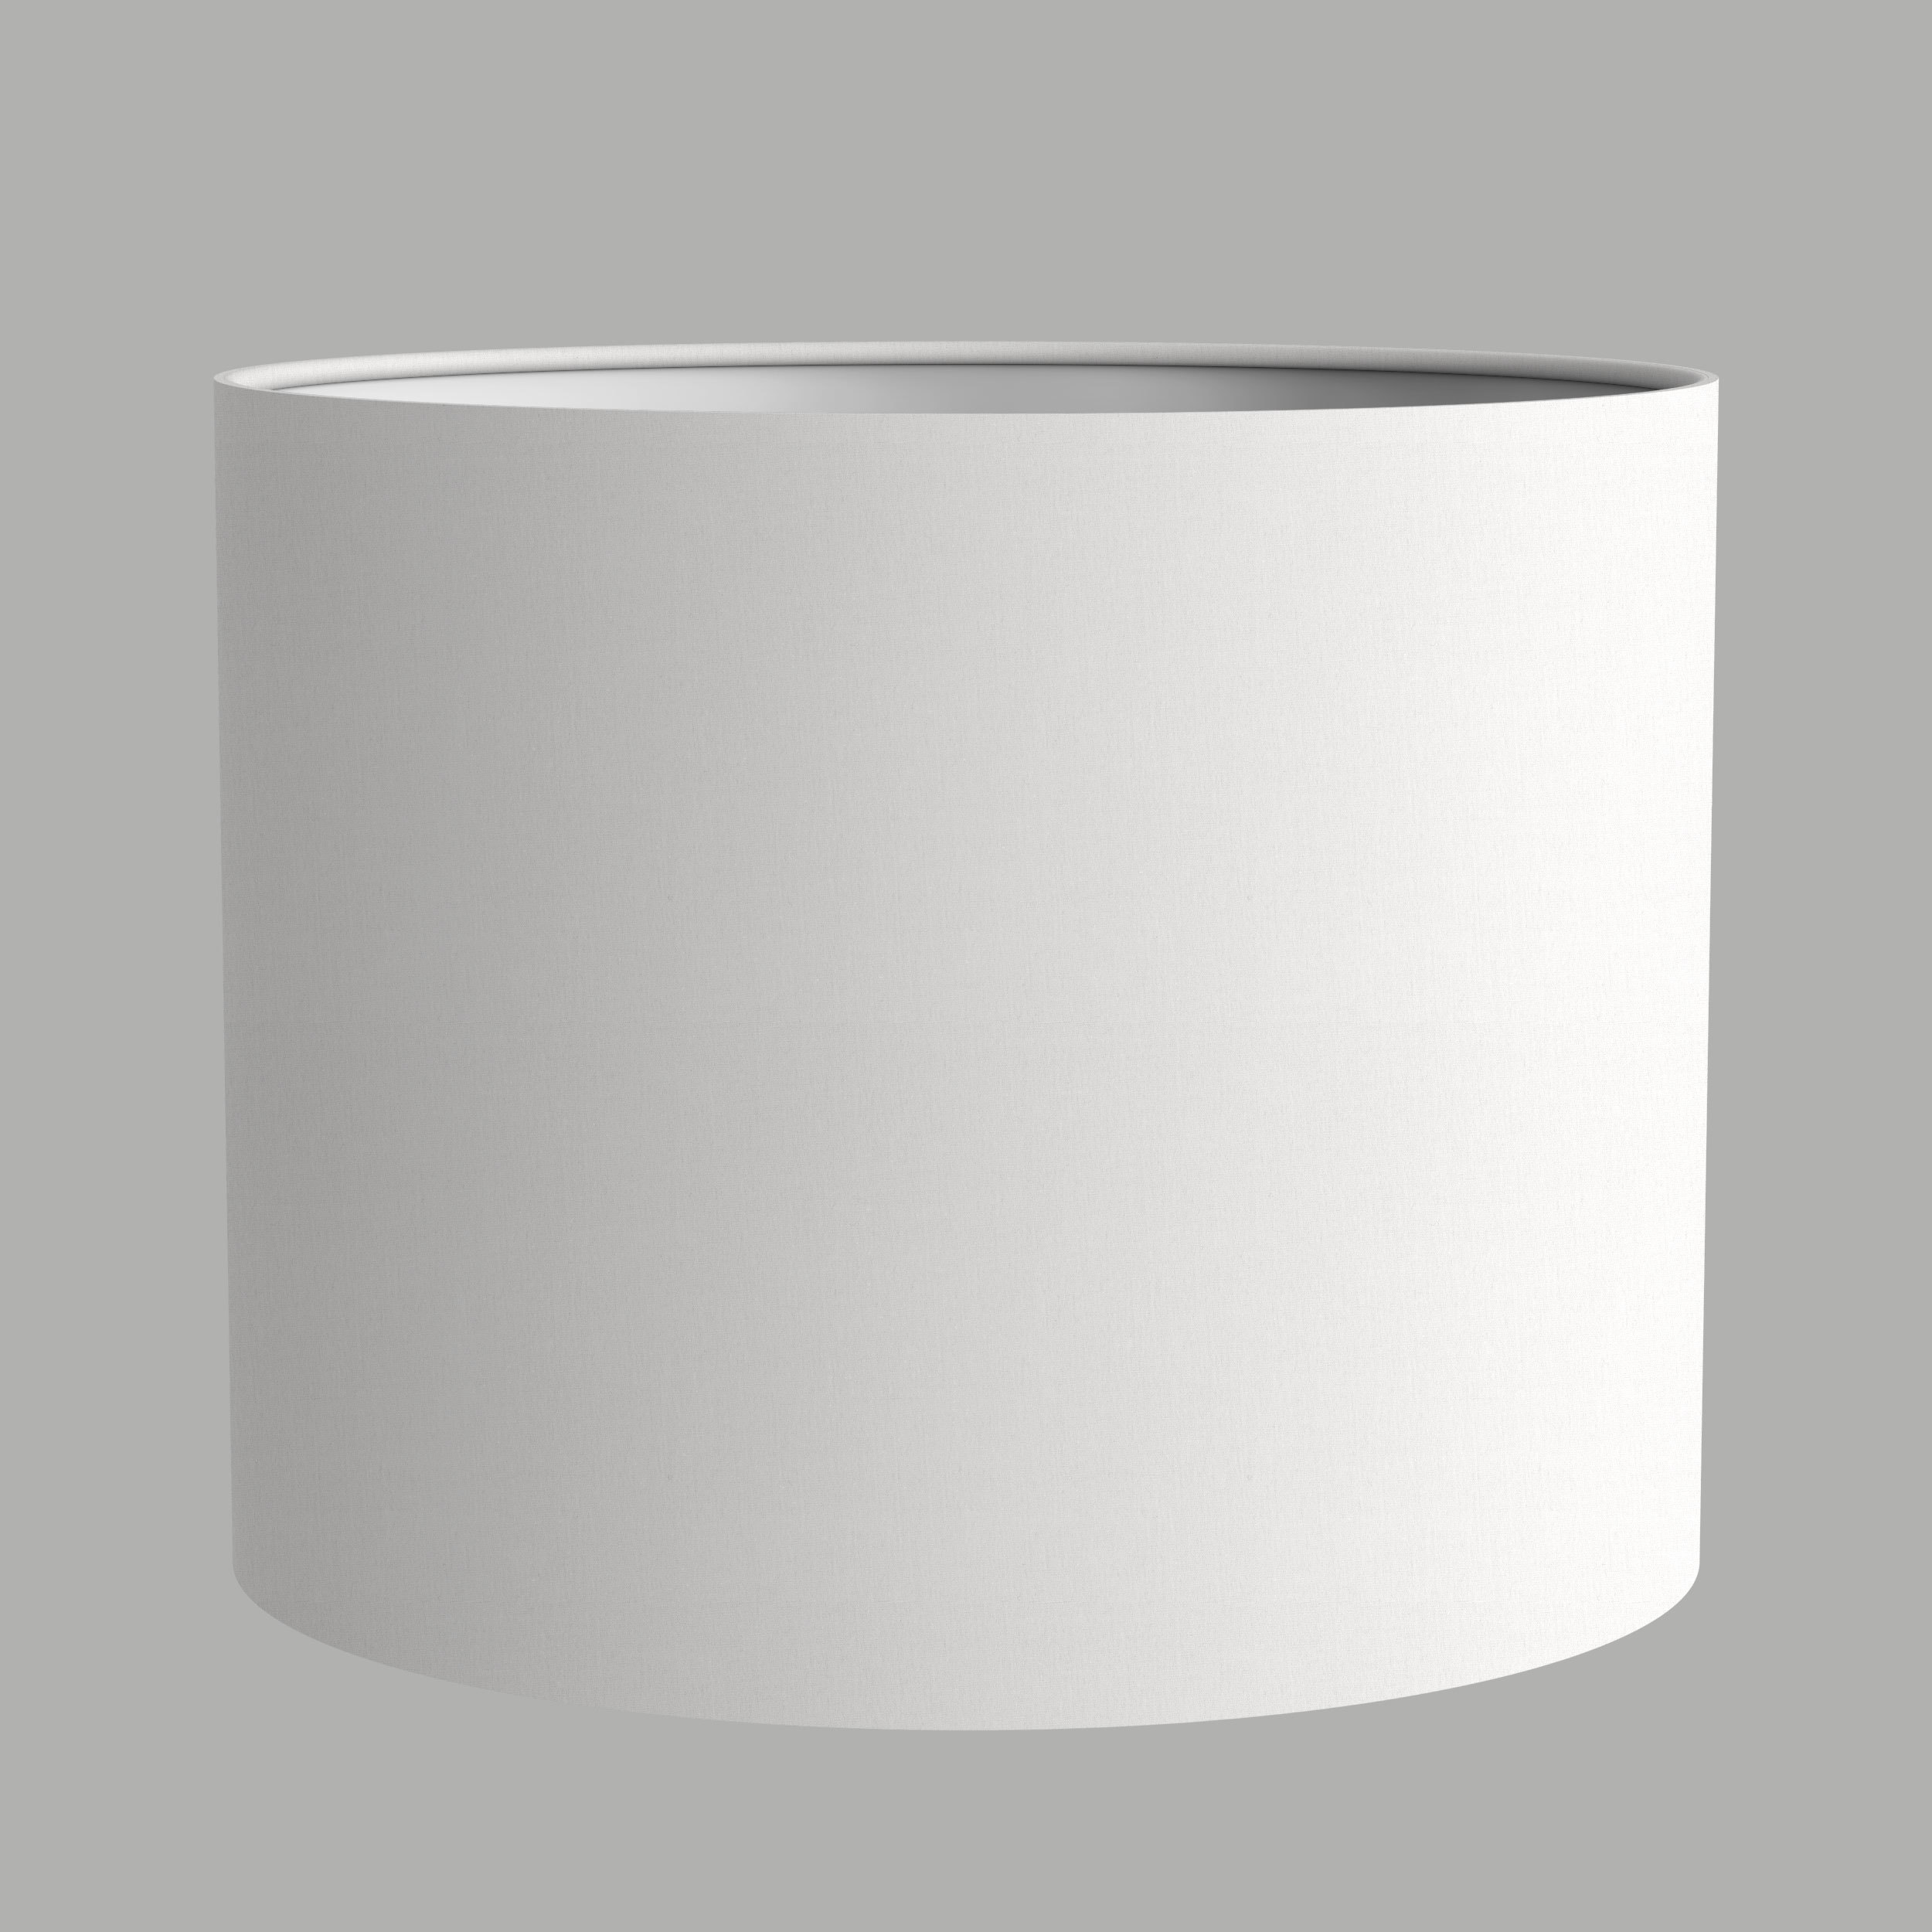 Абажур Astro Drum 5016001 (4061), белый, текстиль - фото 2